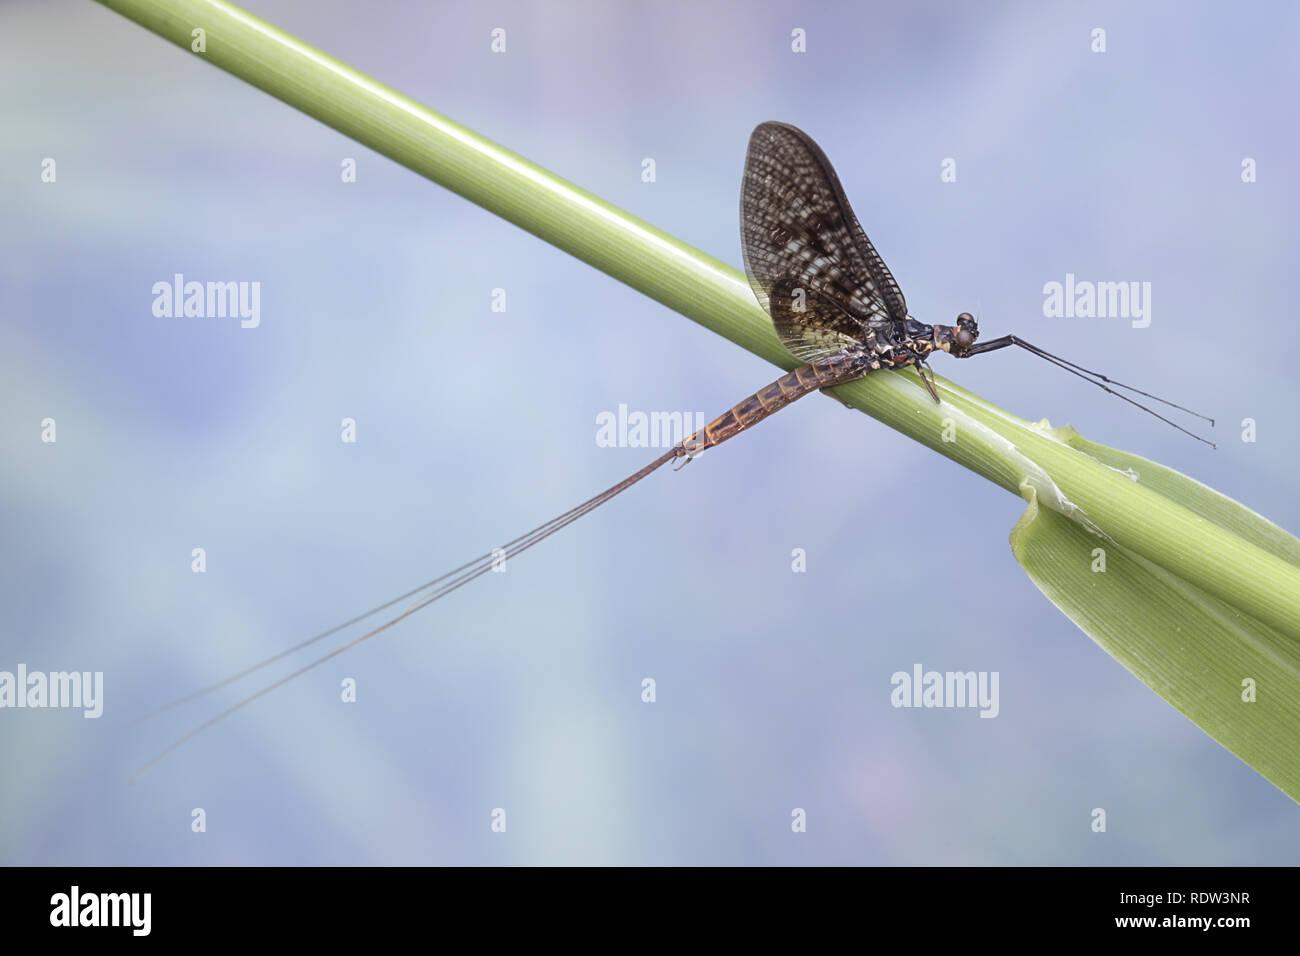 Mayfly, Ephemera vulgata, also called shadfly and fishfly - Stock Image